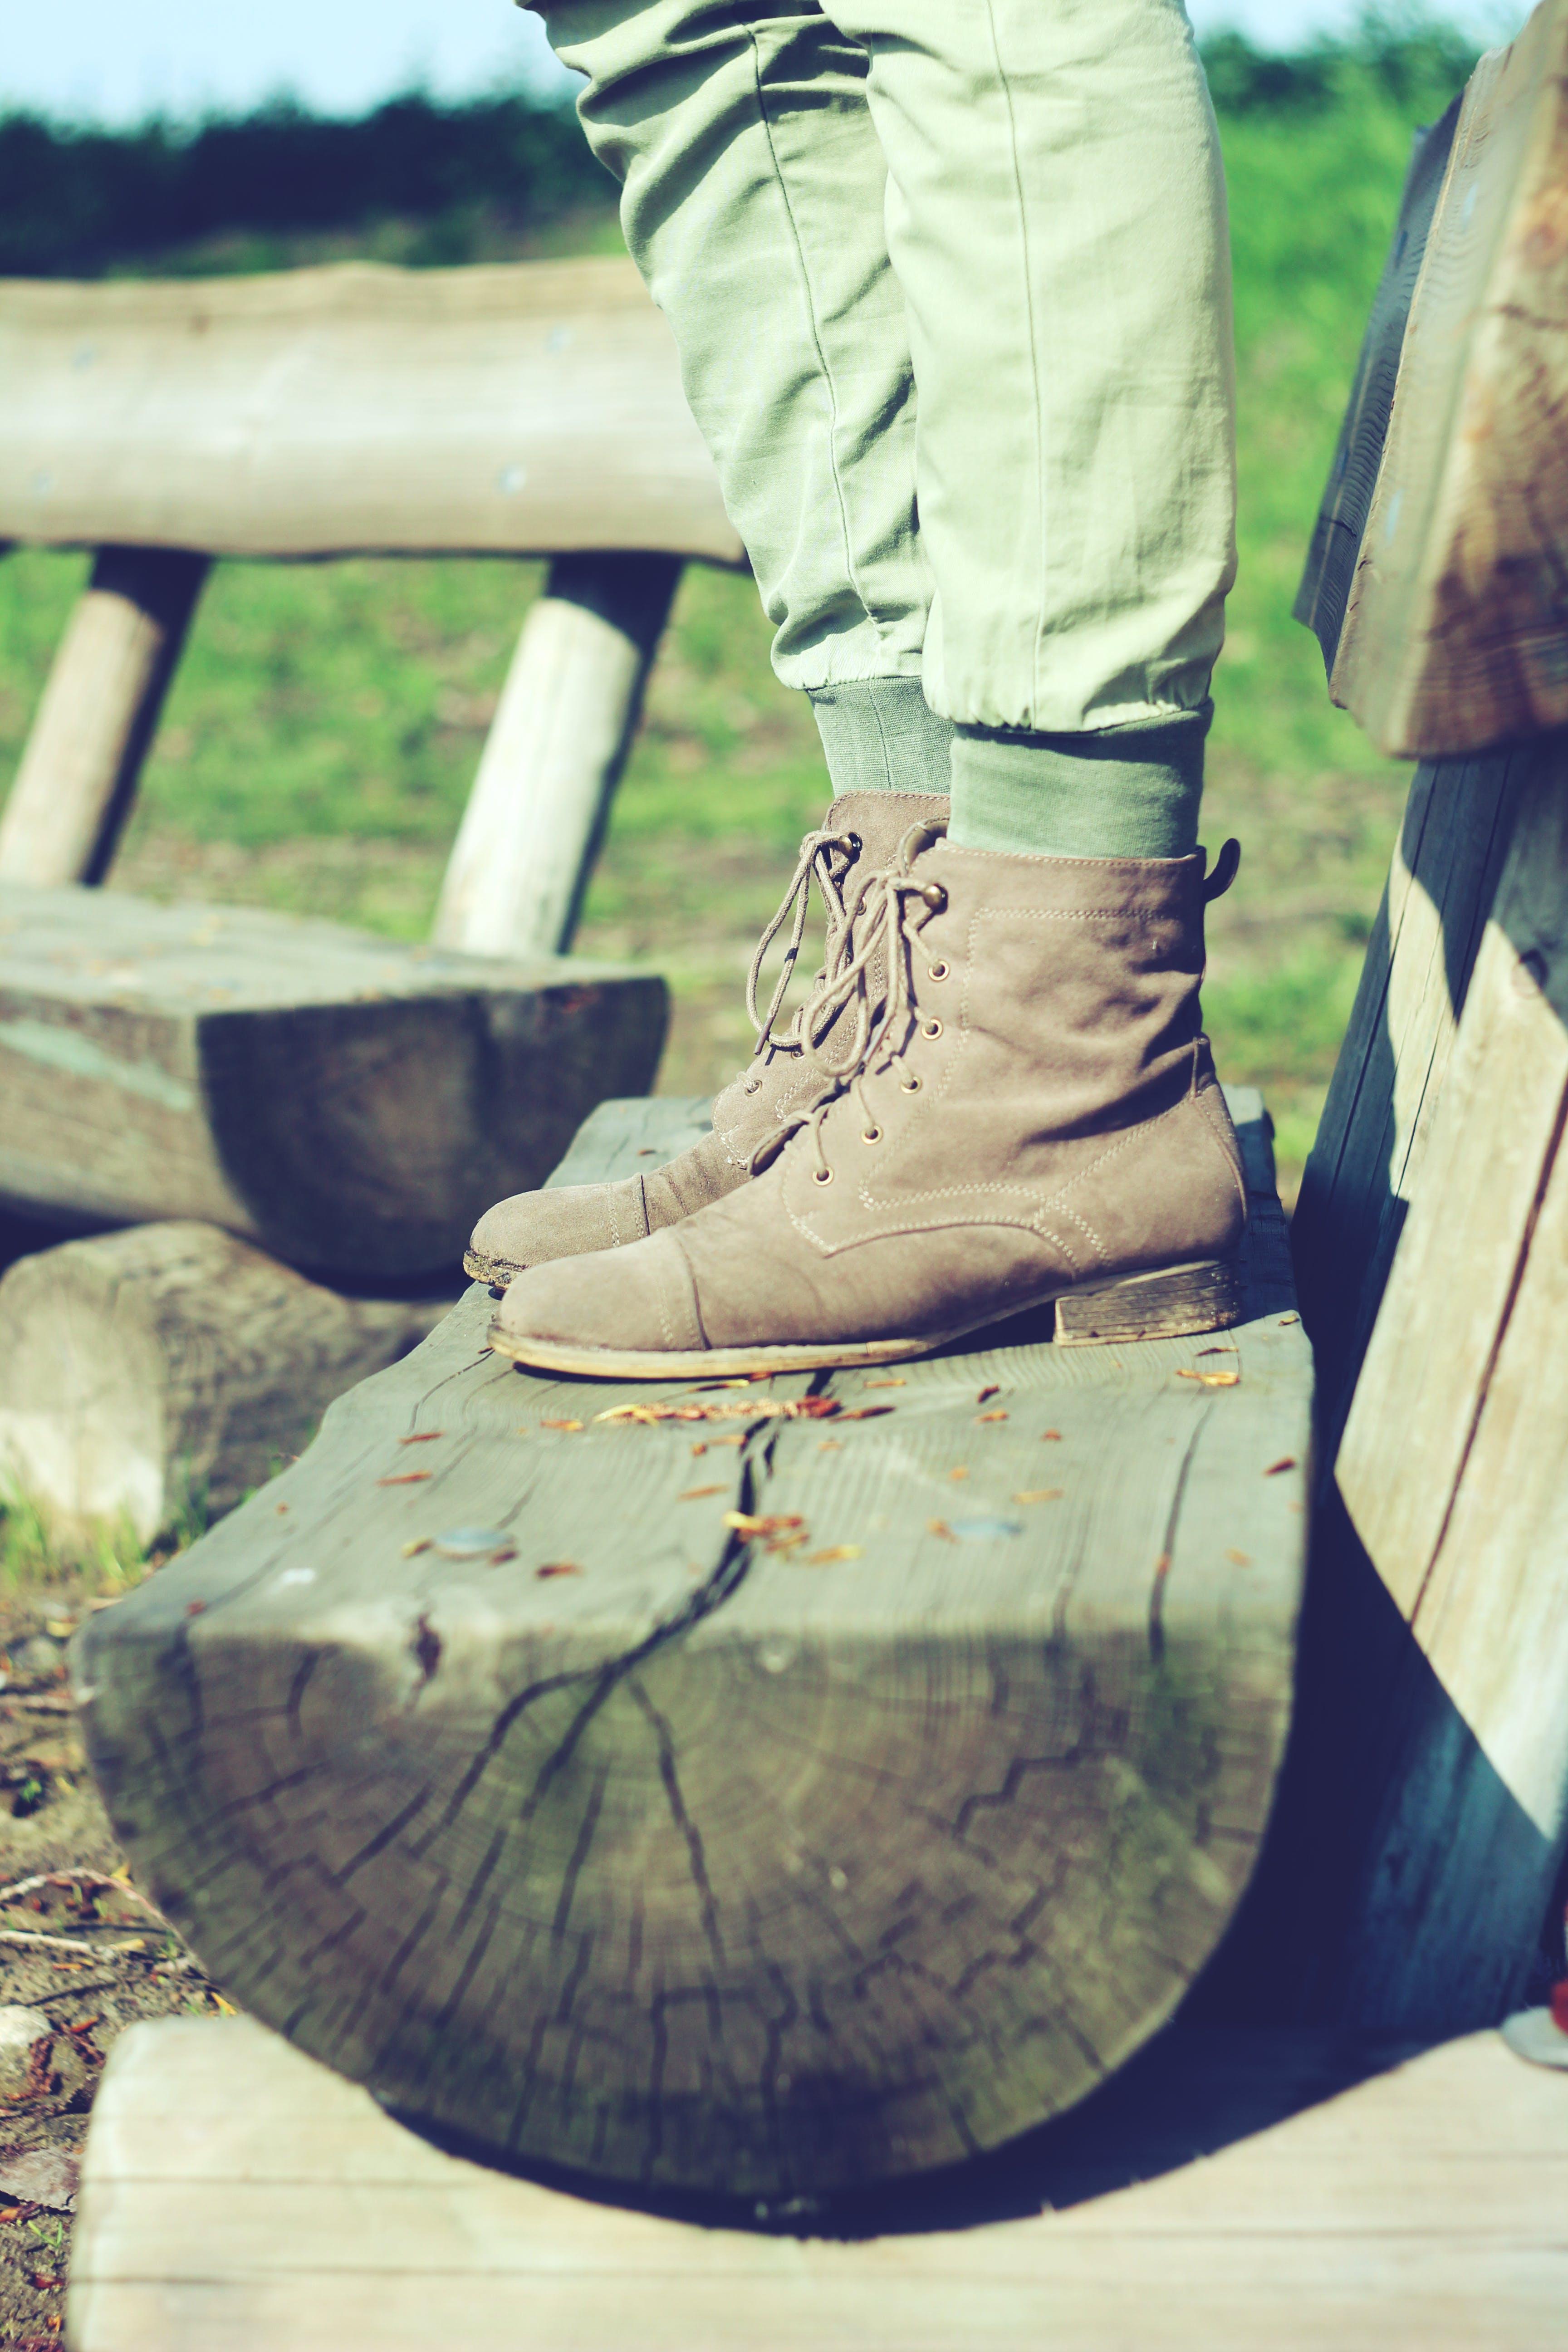 Vintage shoes II